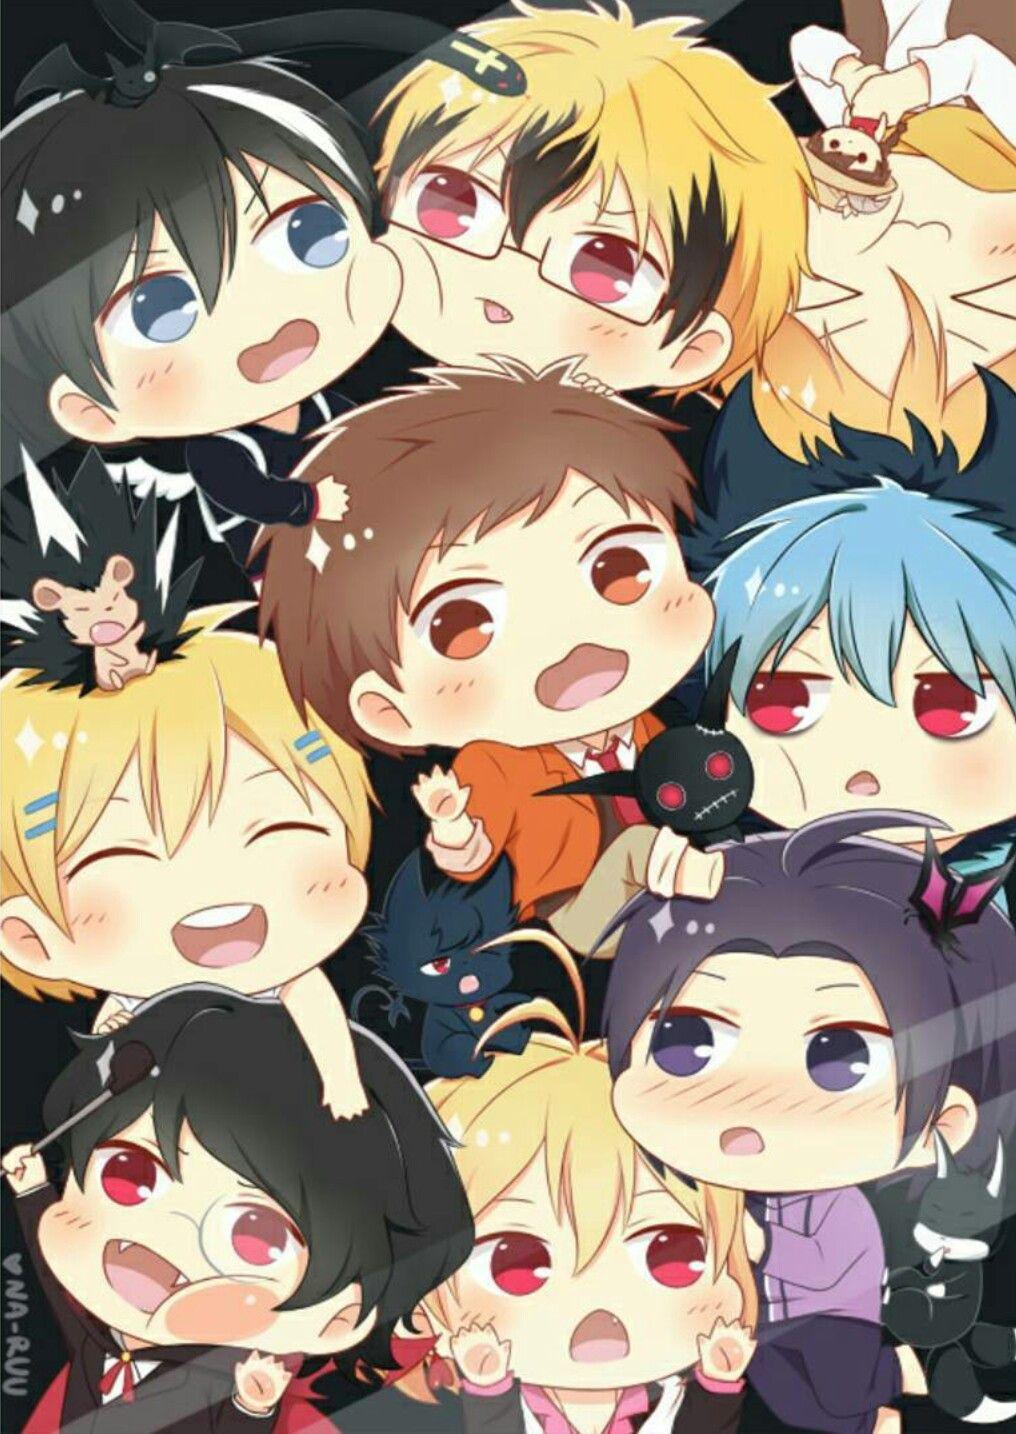 Lucu Anime Anak Laki Laki Chibi Manga Anime